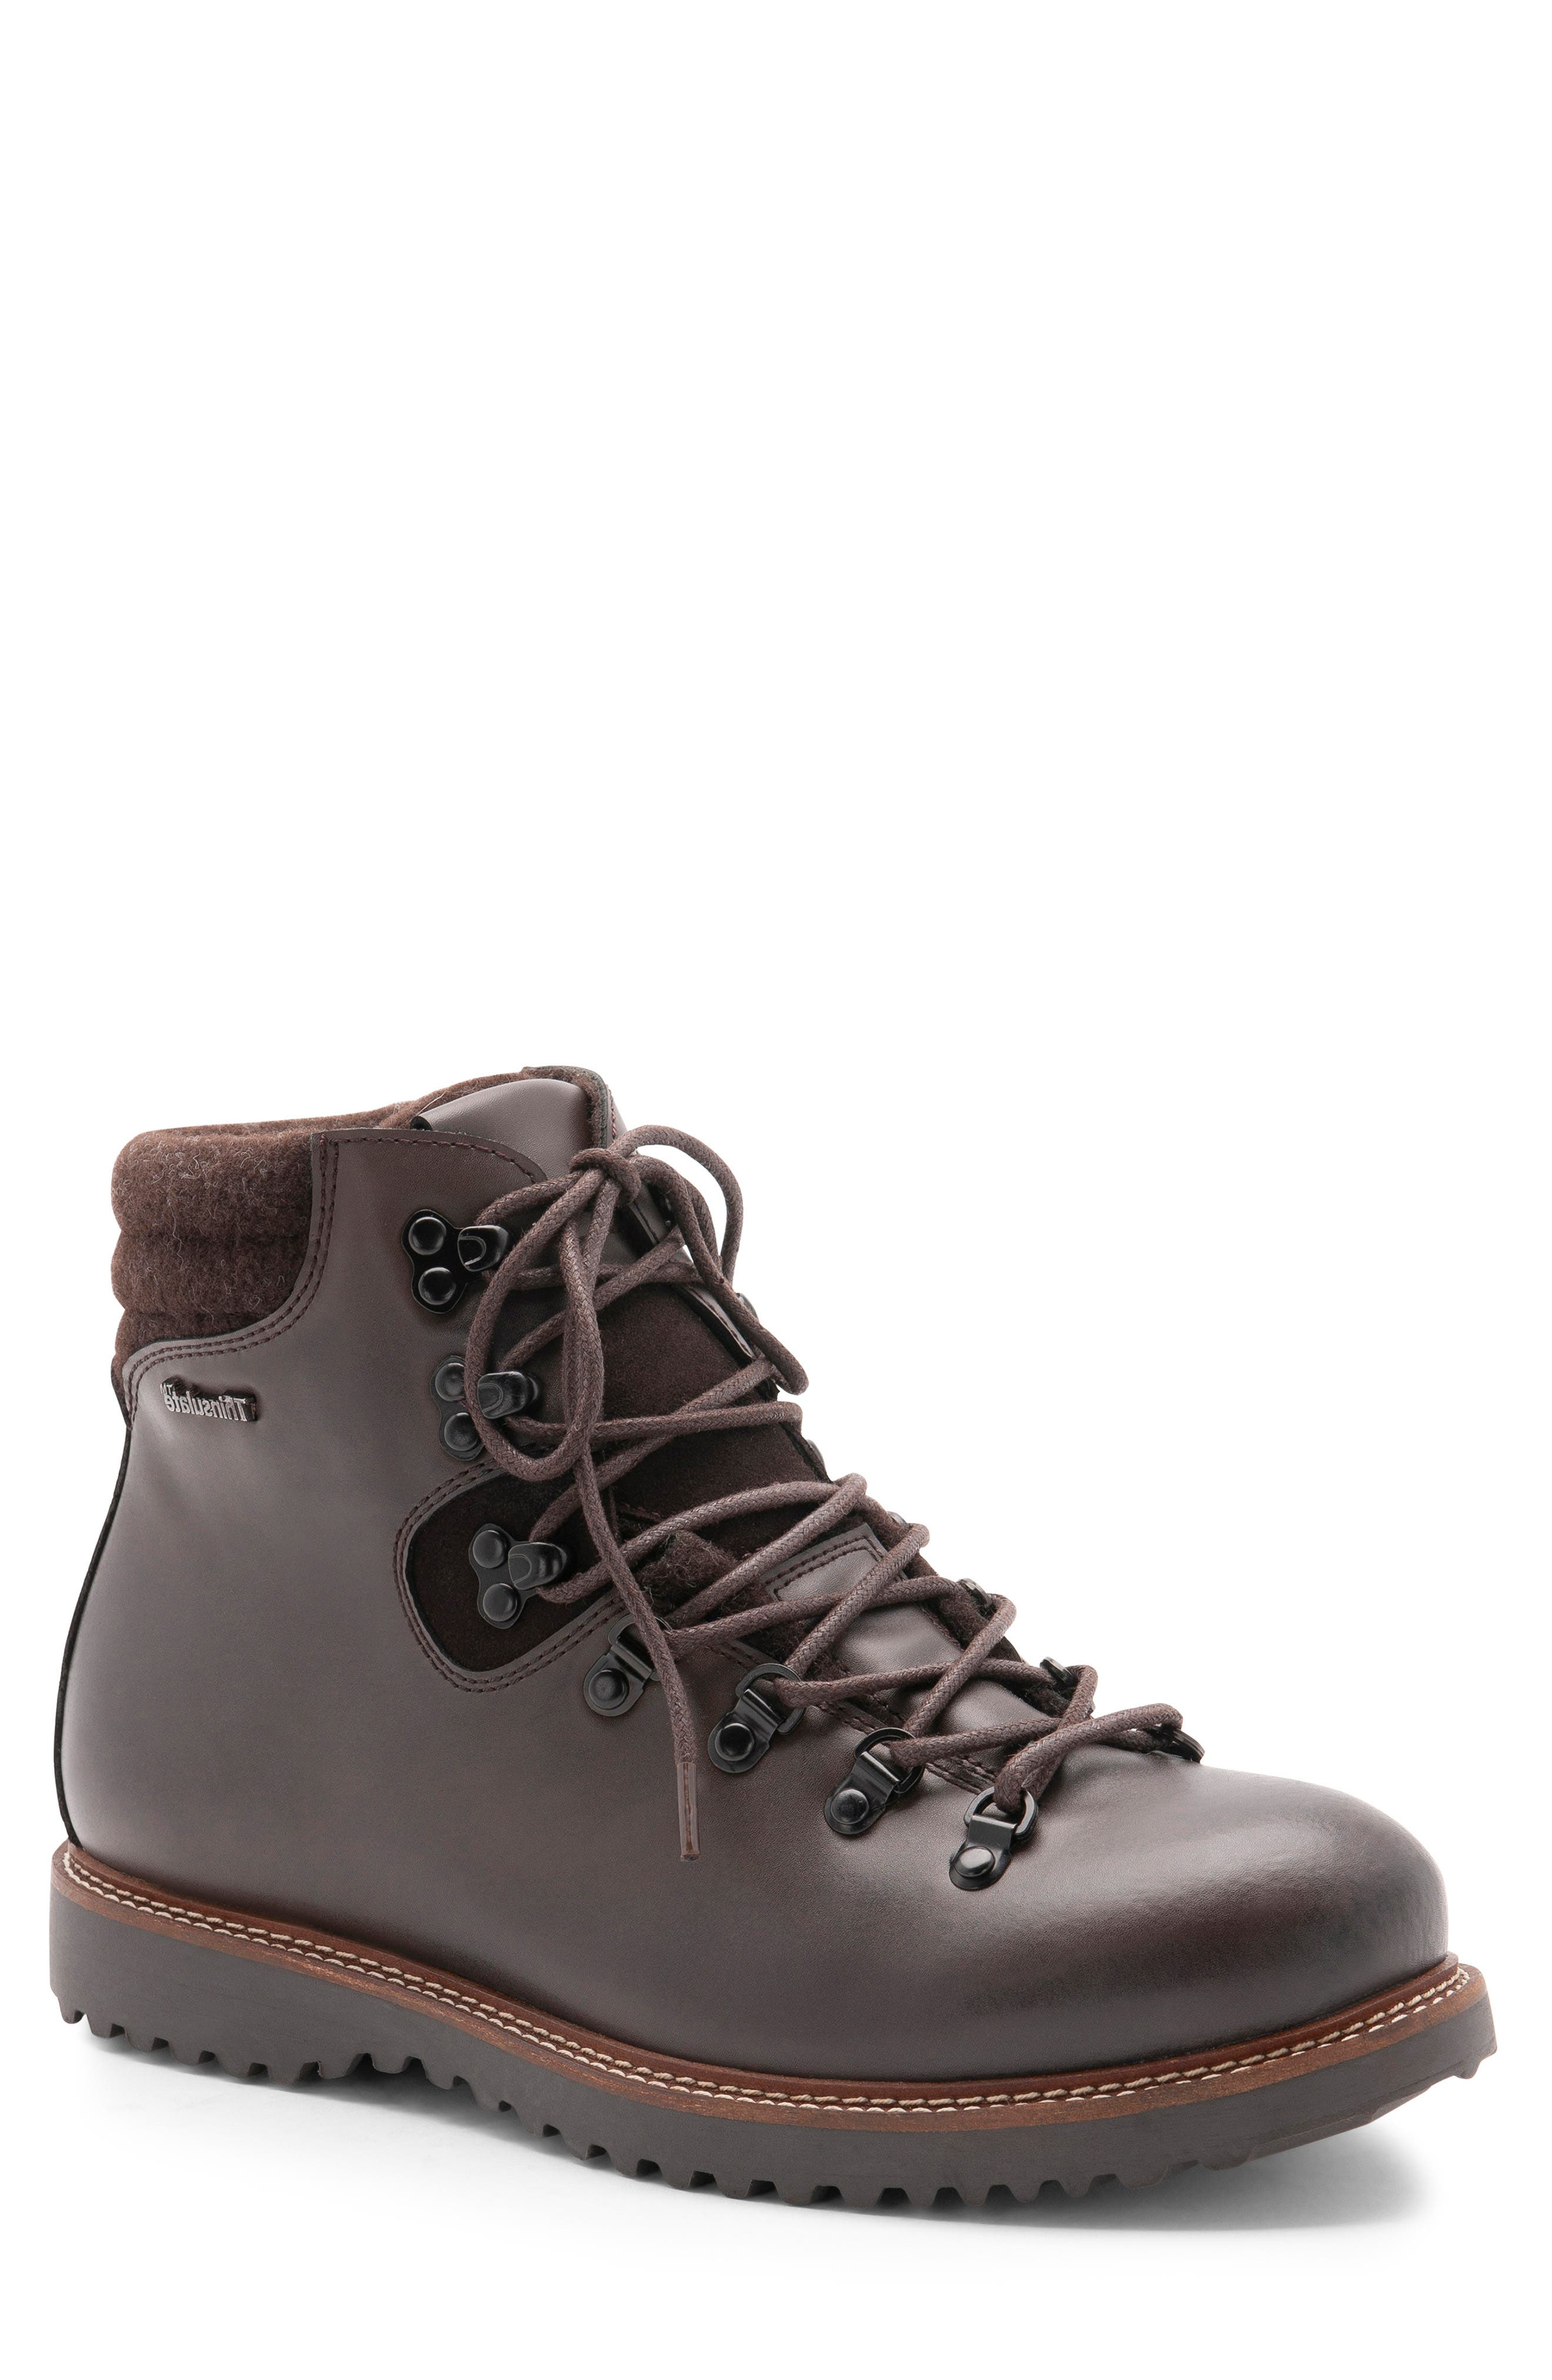 Blondo Morgan Waterproof Plain Toe Boot- Brown